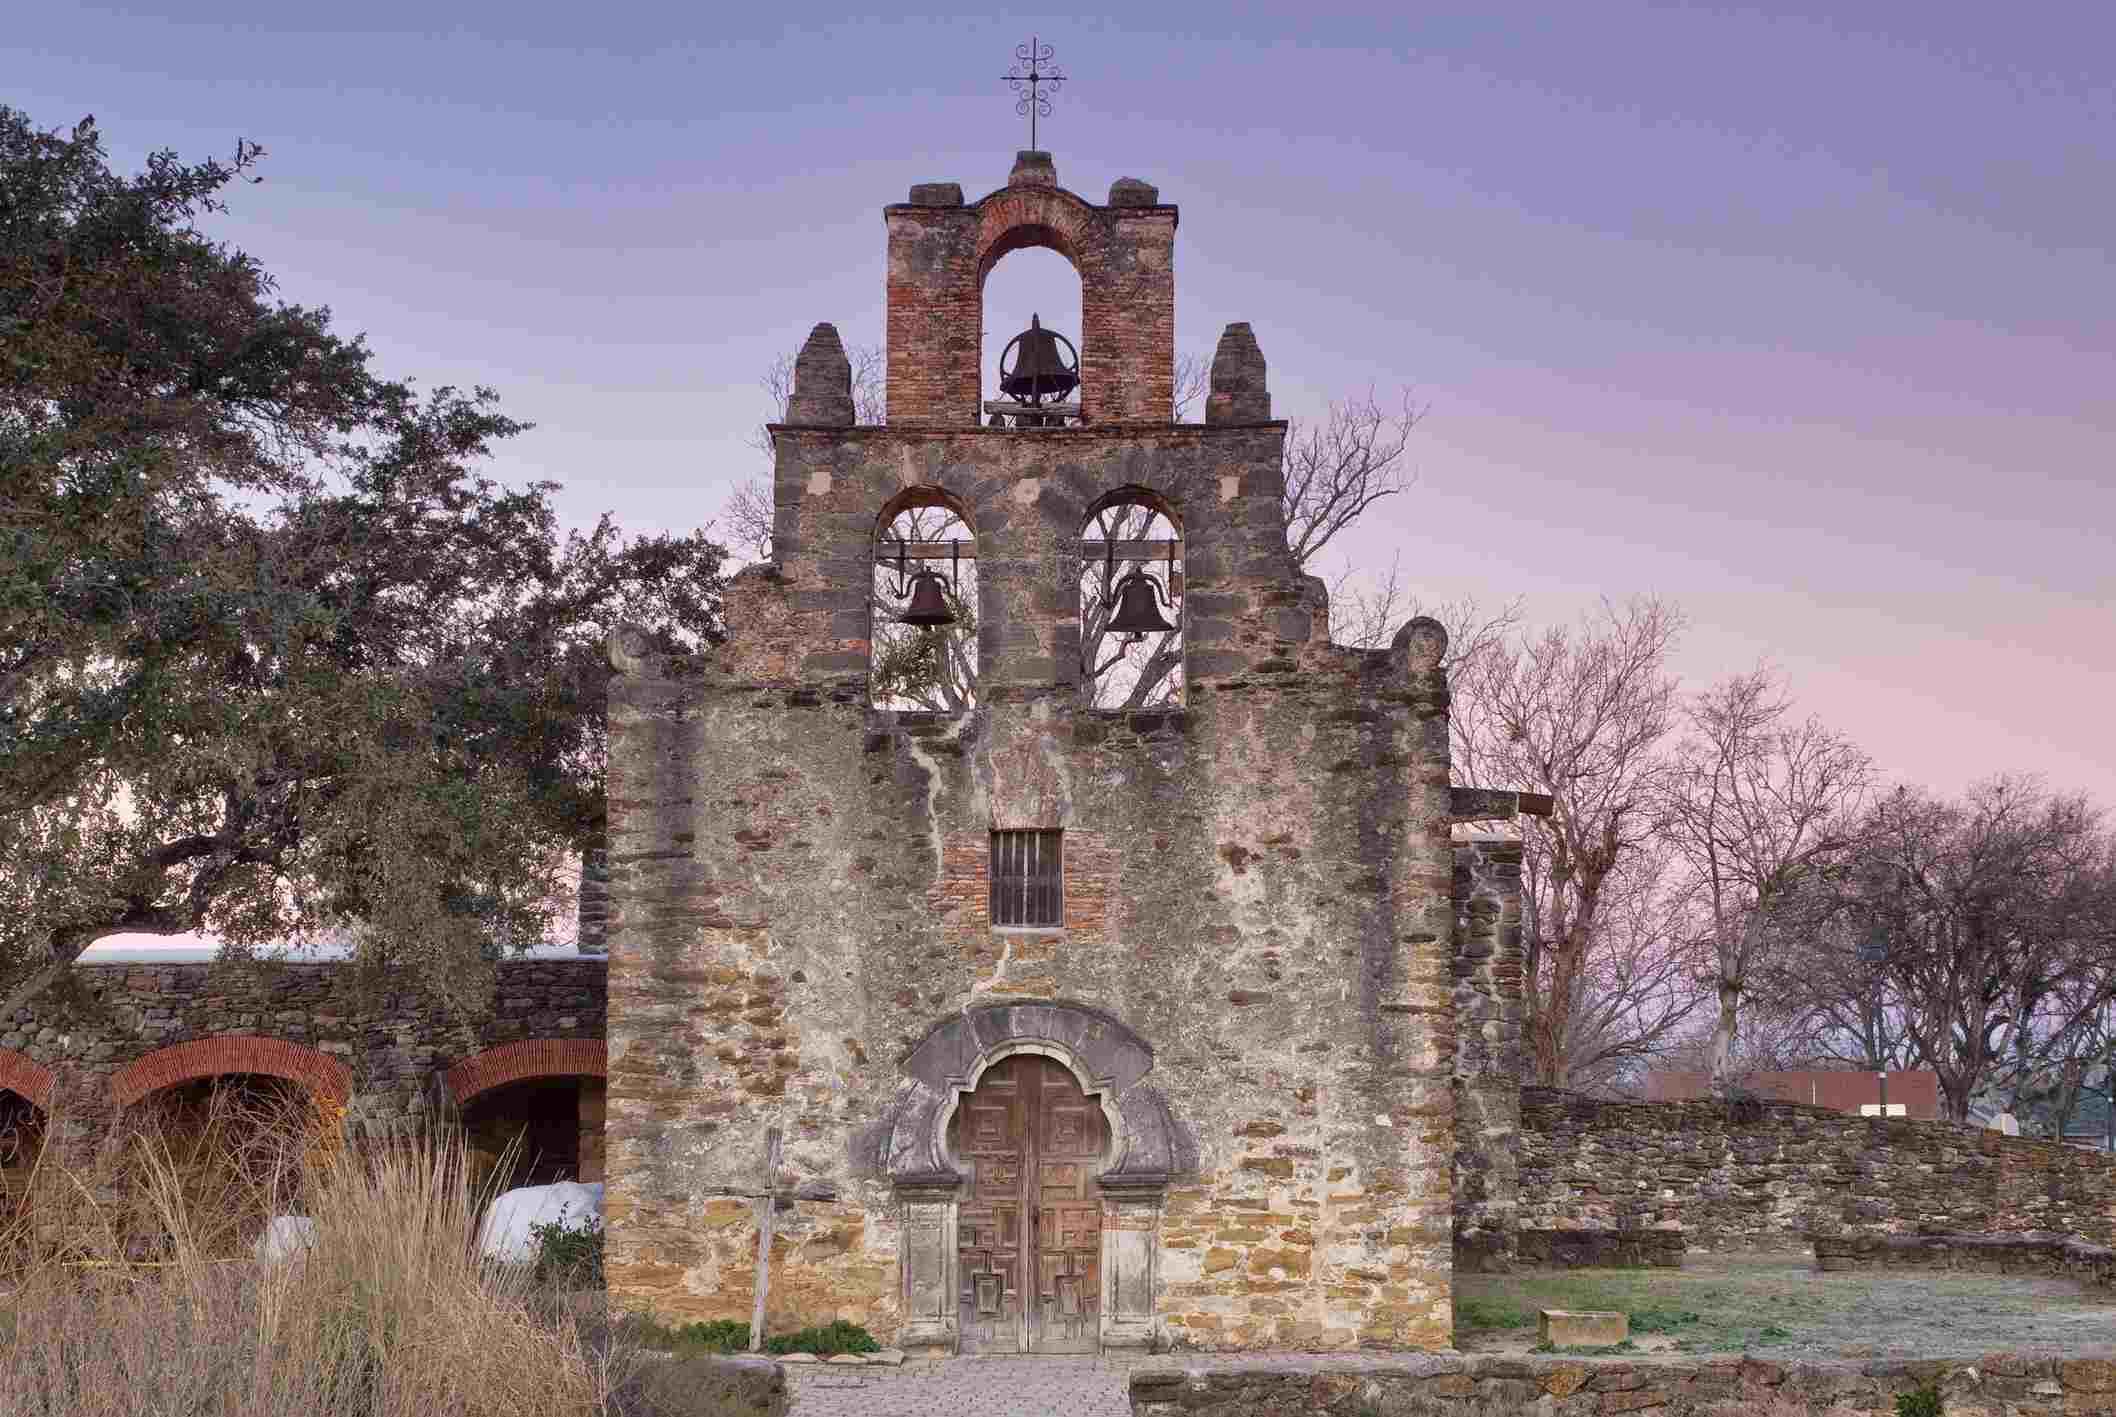 Church at Mission Espada at sunrise.